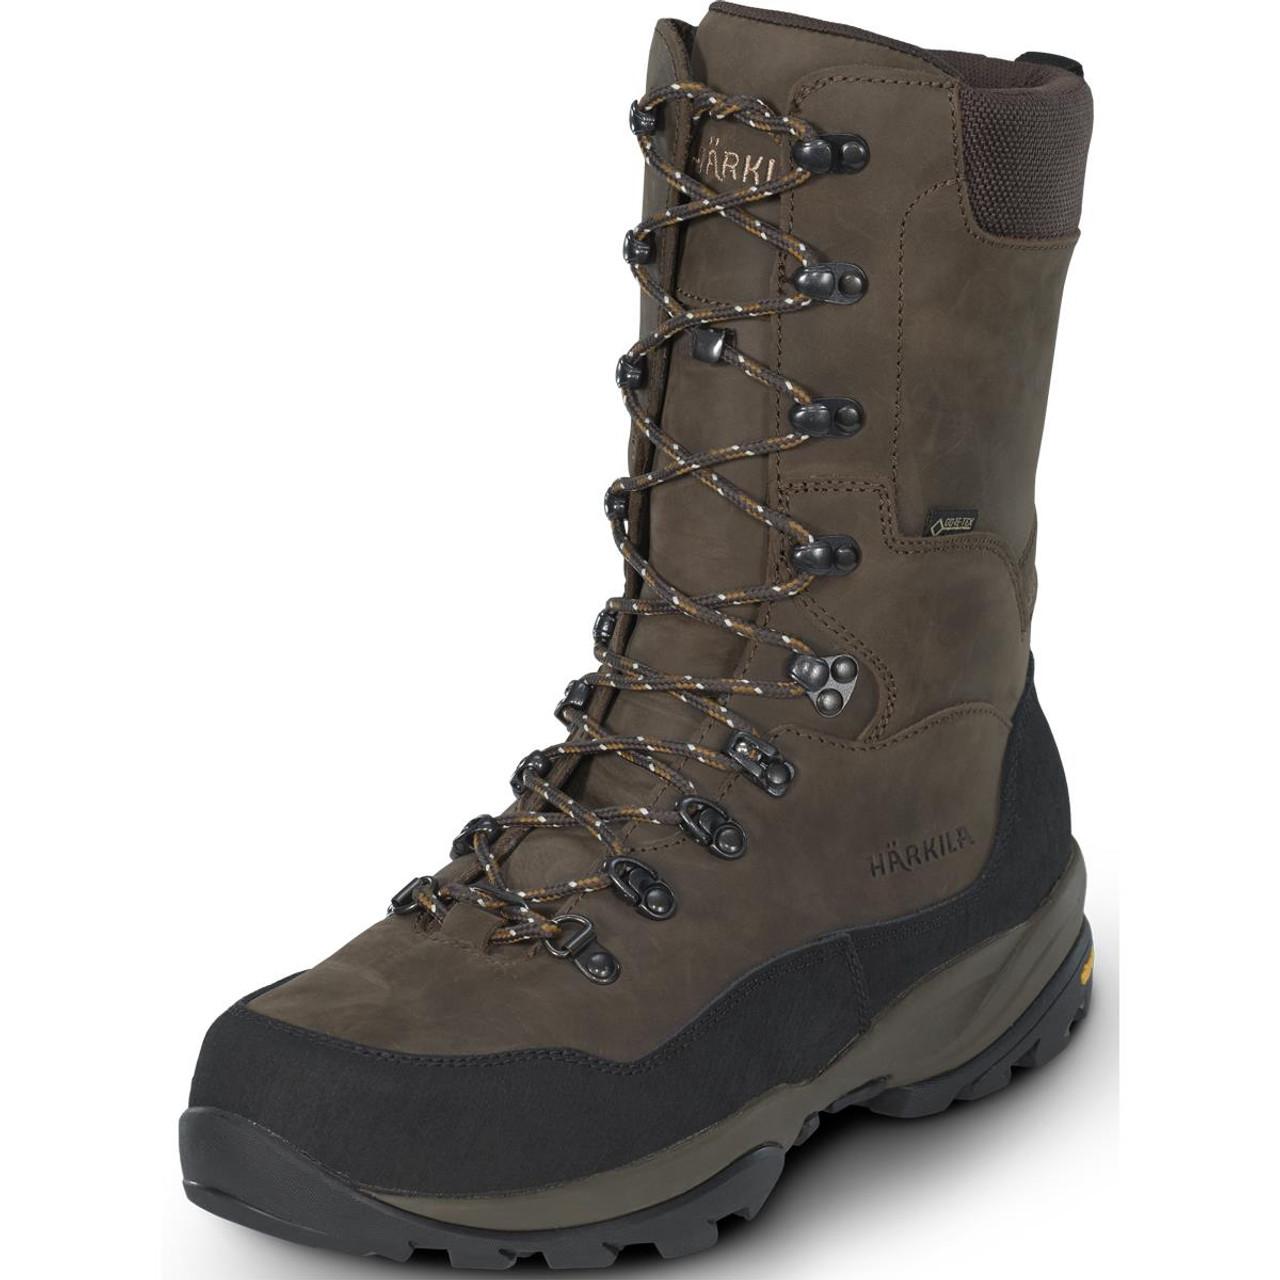 Dark Brown Harkila Mens Pro Hunter Ridge GTX Boots